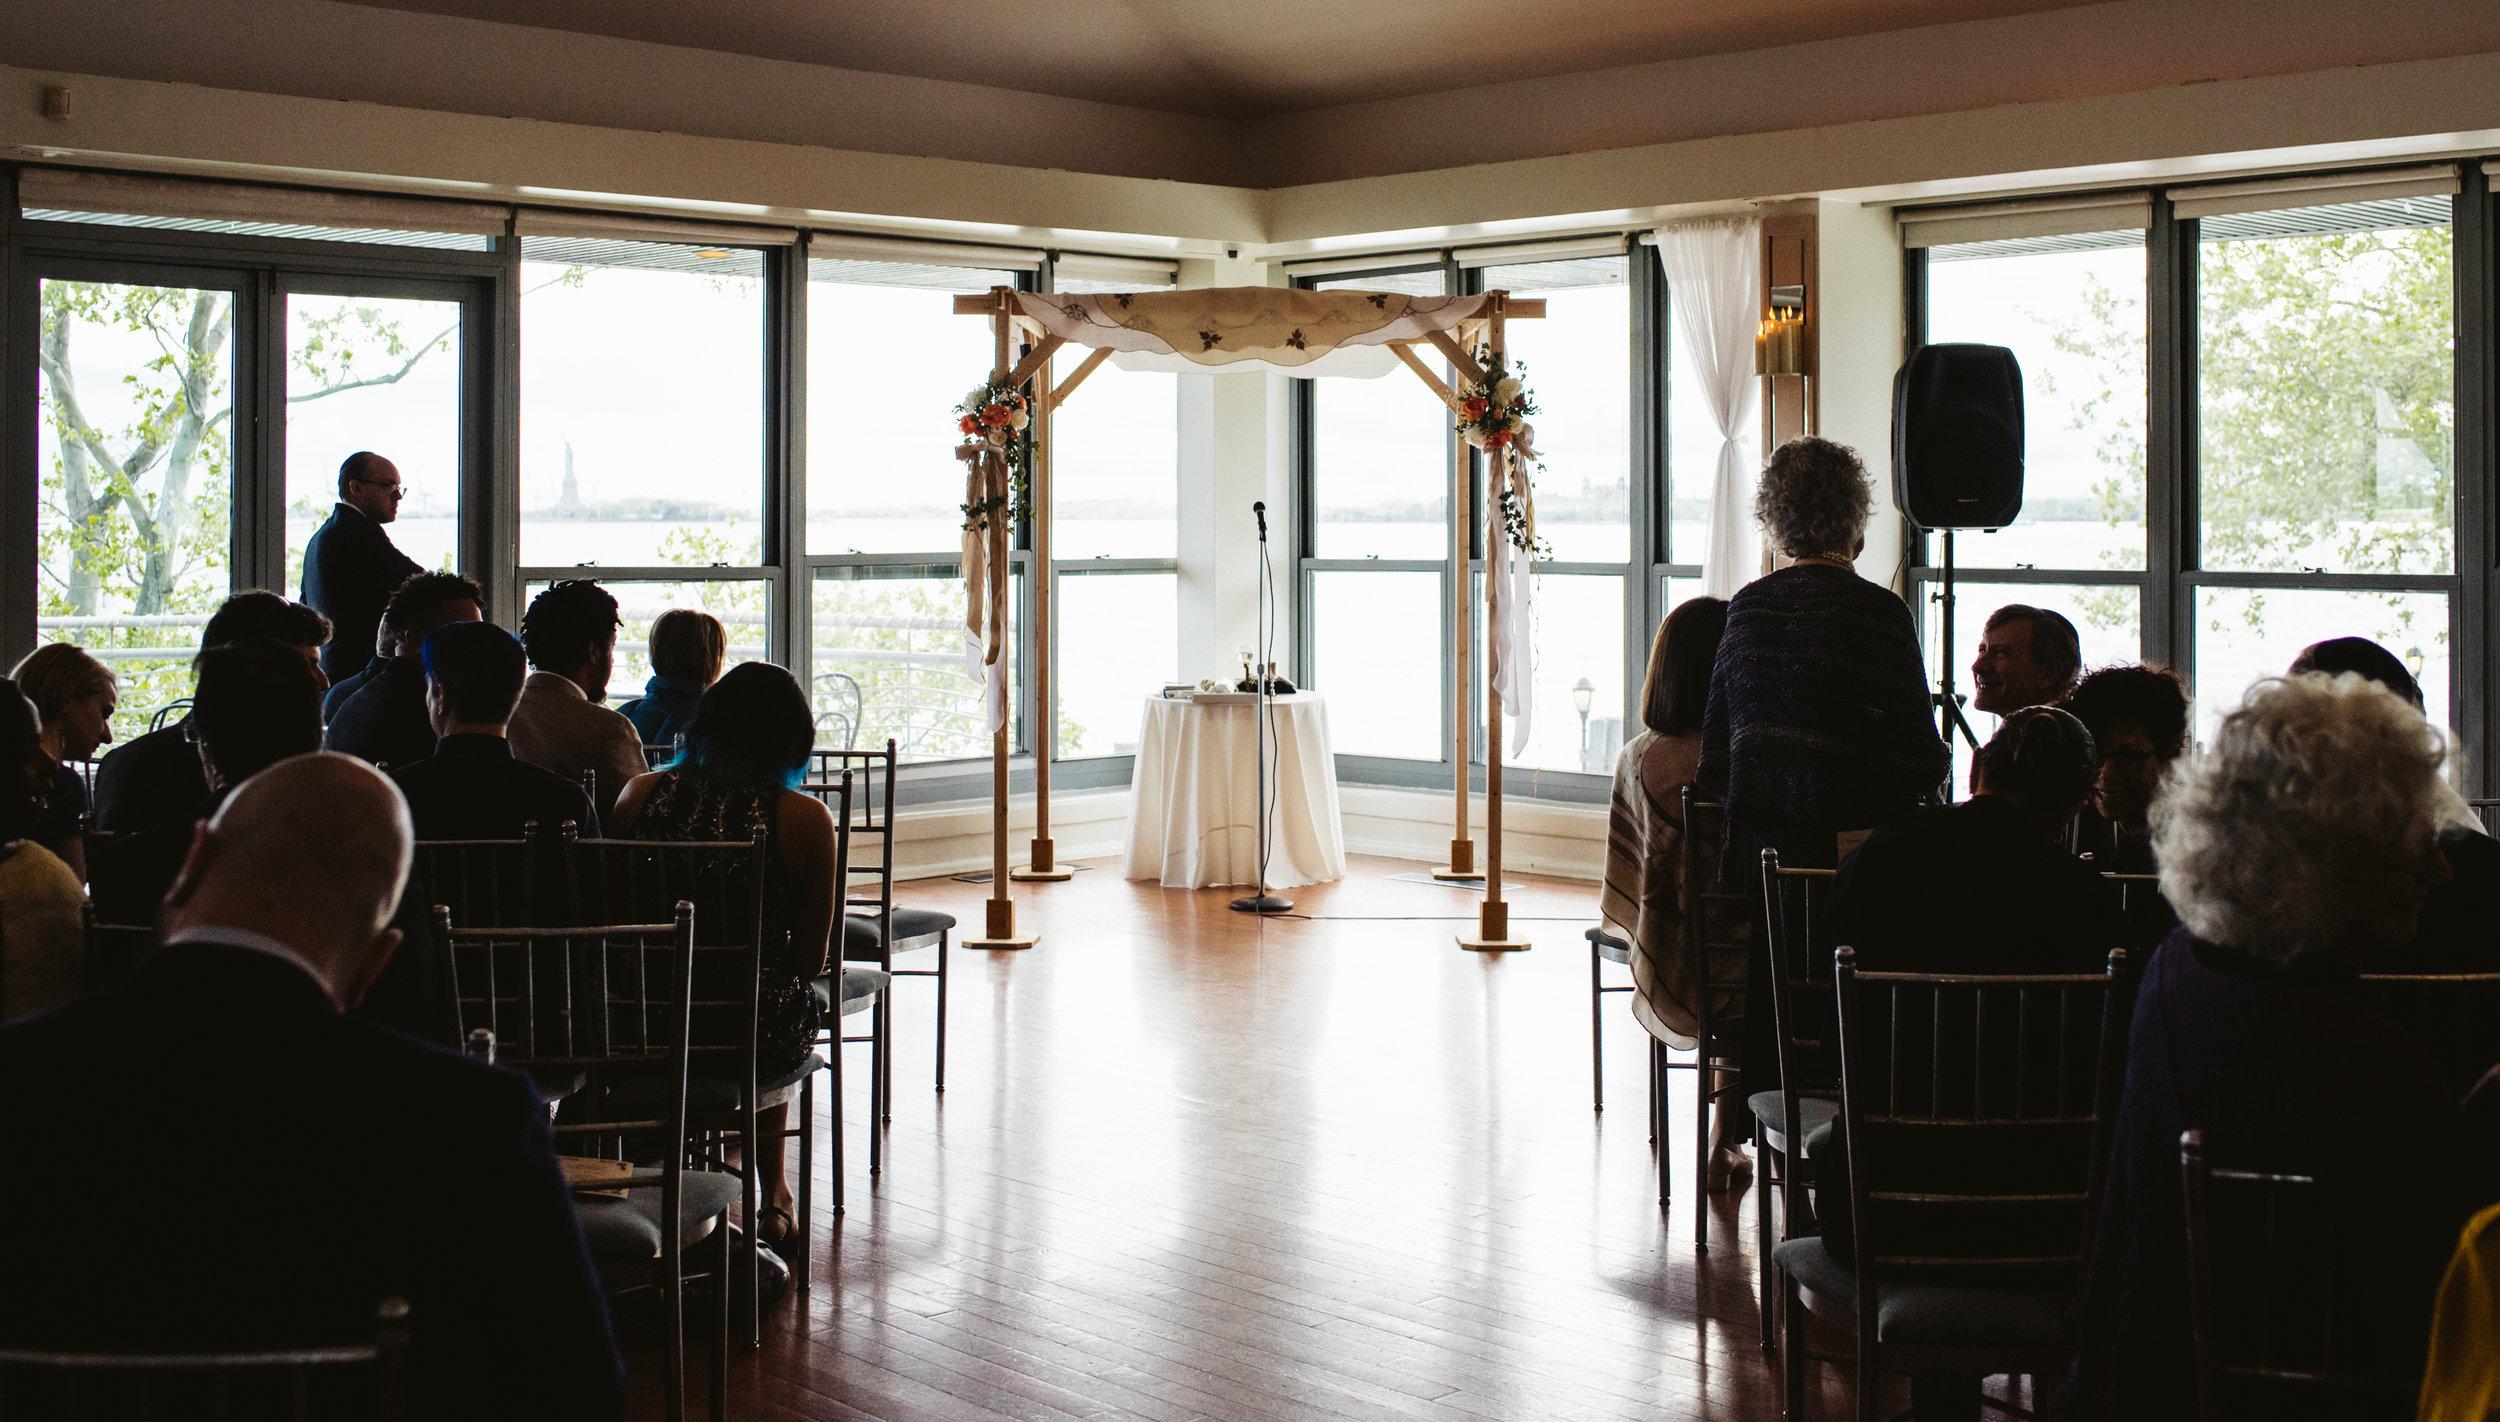 LIZA & JON - BATTERY PARK WEDDING - NYC INTIMATE WEDDING PHOTOGRAPHER - CHI-CHI AGBIM-339.jpg